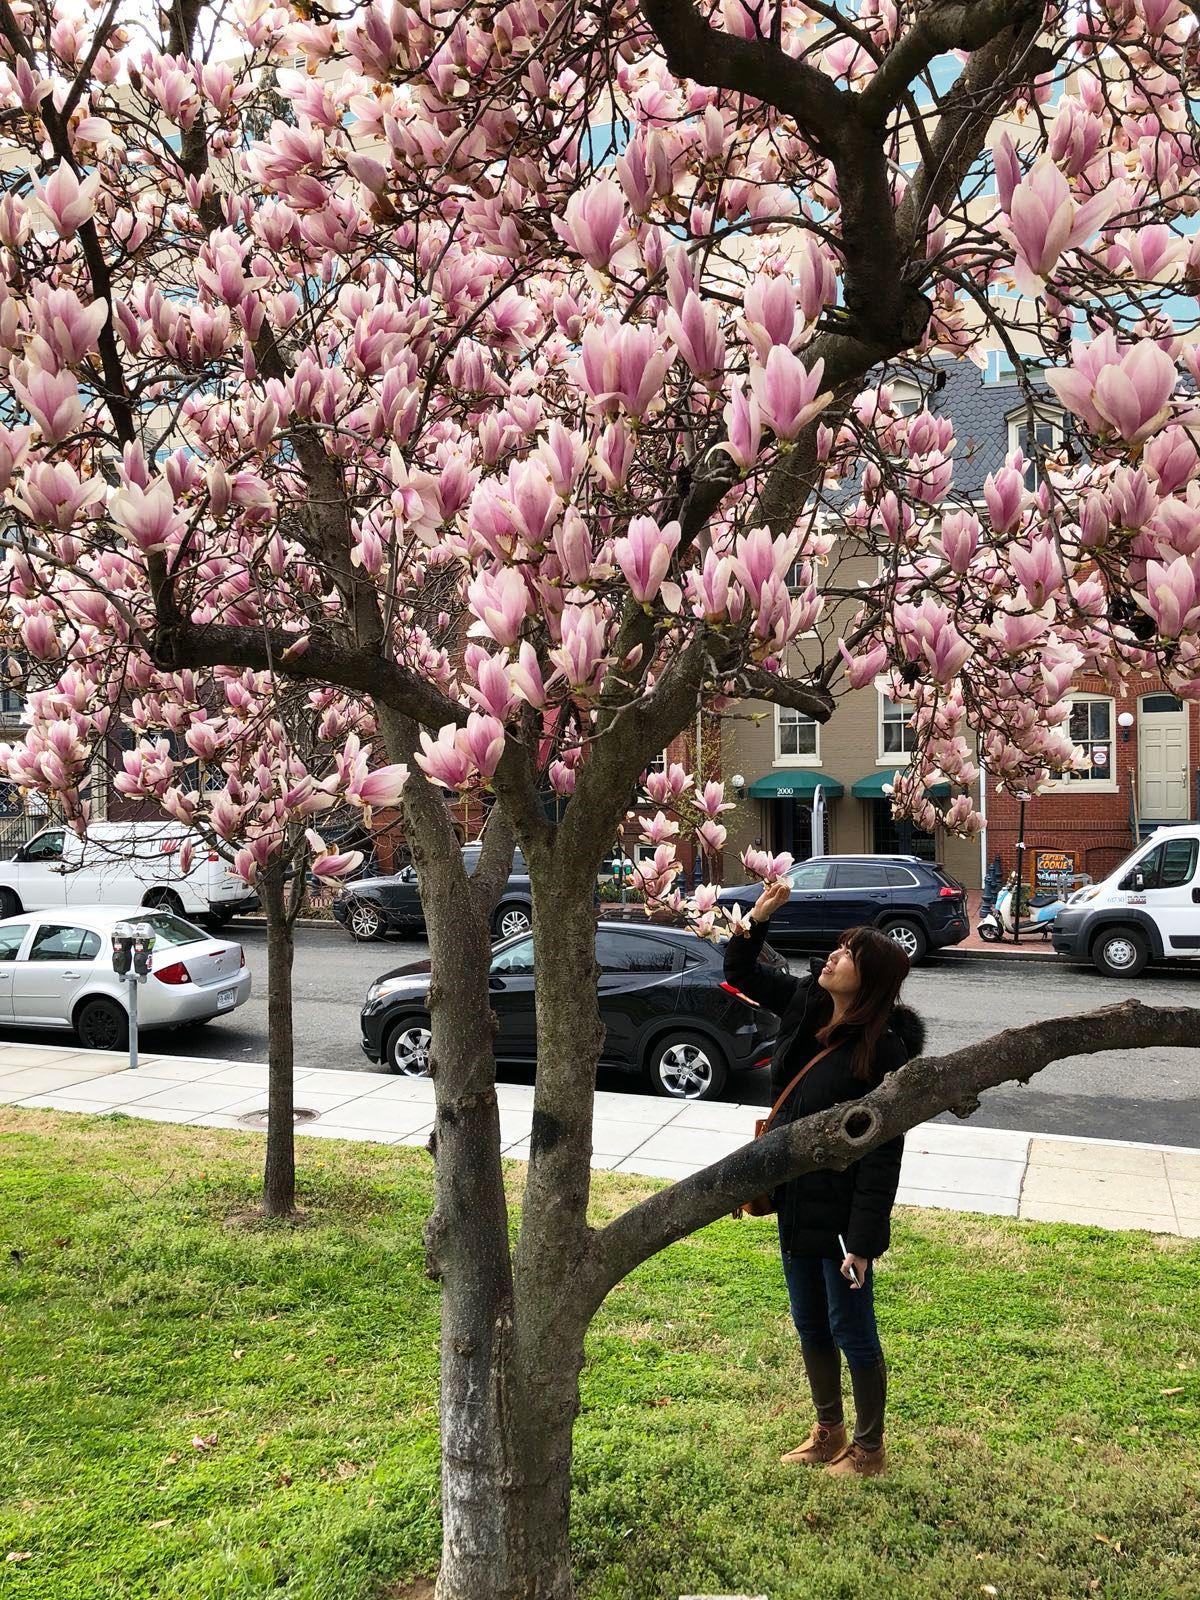 PUTIEN Peach Colorful Boys and Girls Soft Short Sleeve T-Shirt,Japanese Scenery Sakura